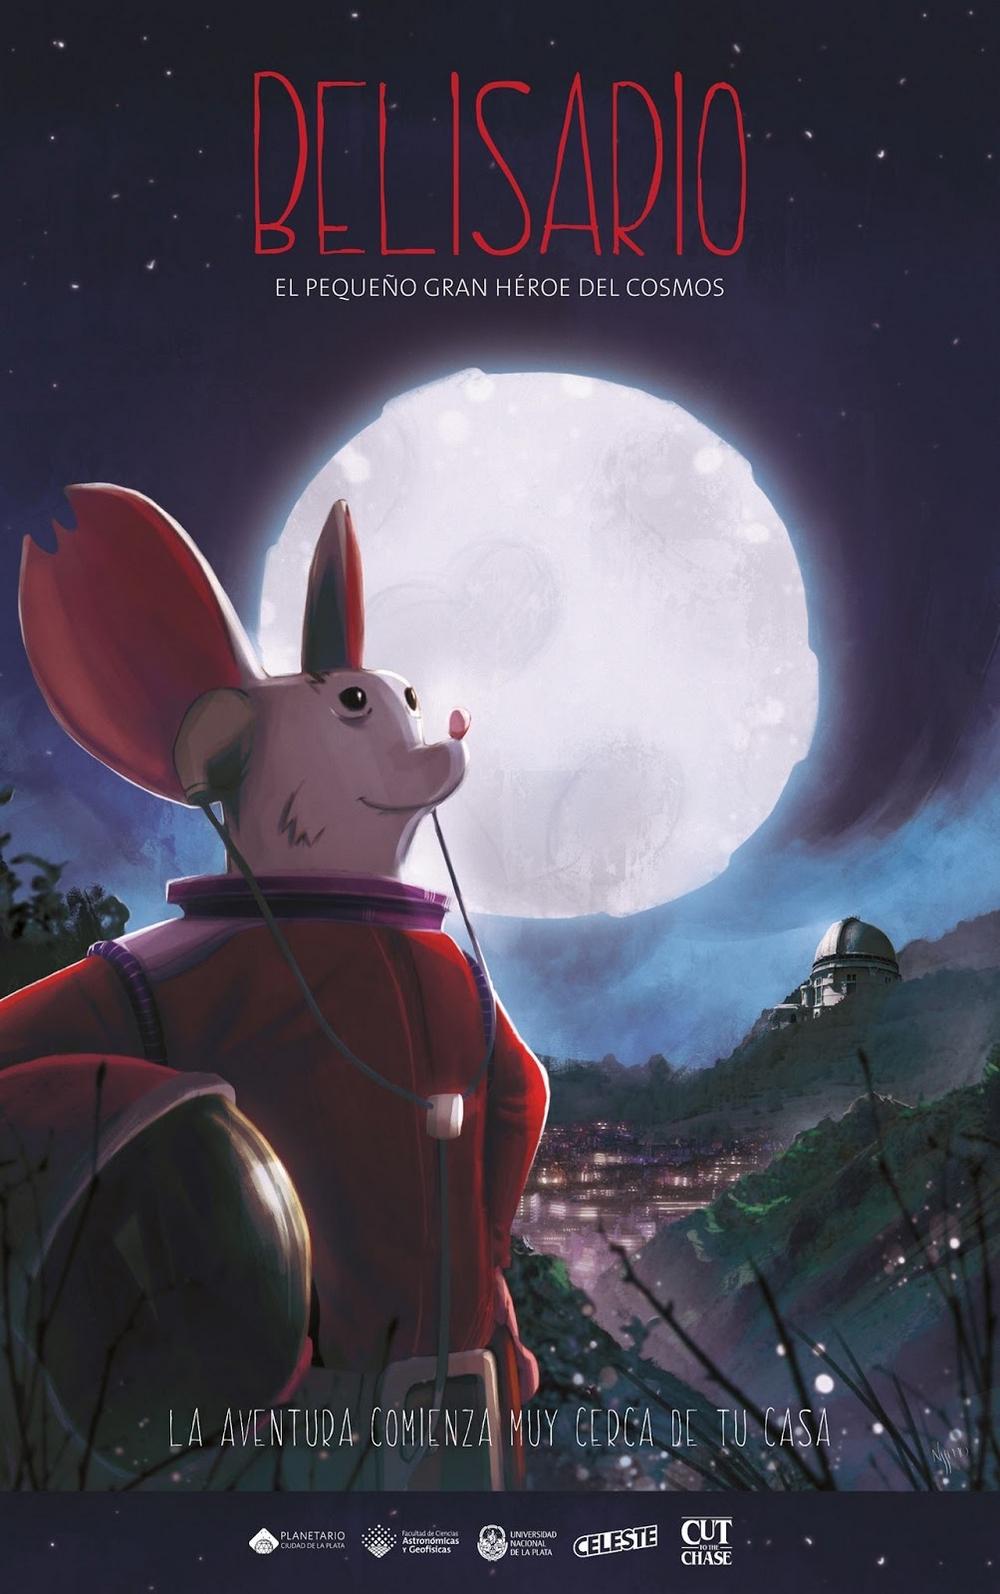 Belisario - The Little Big Hero of the Cosmos